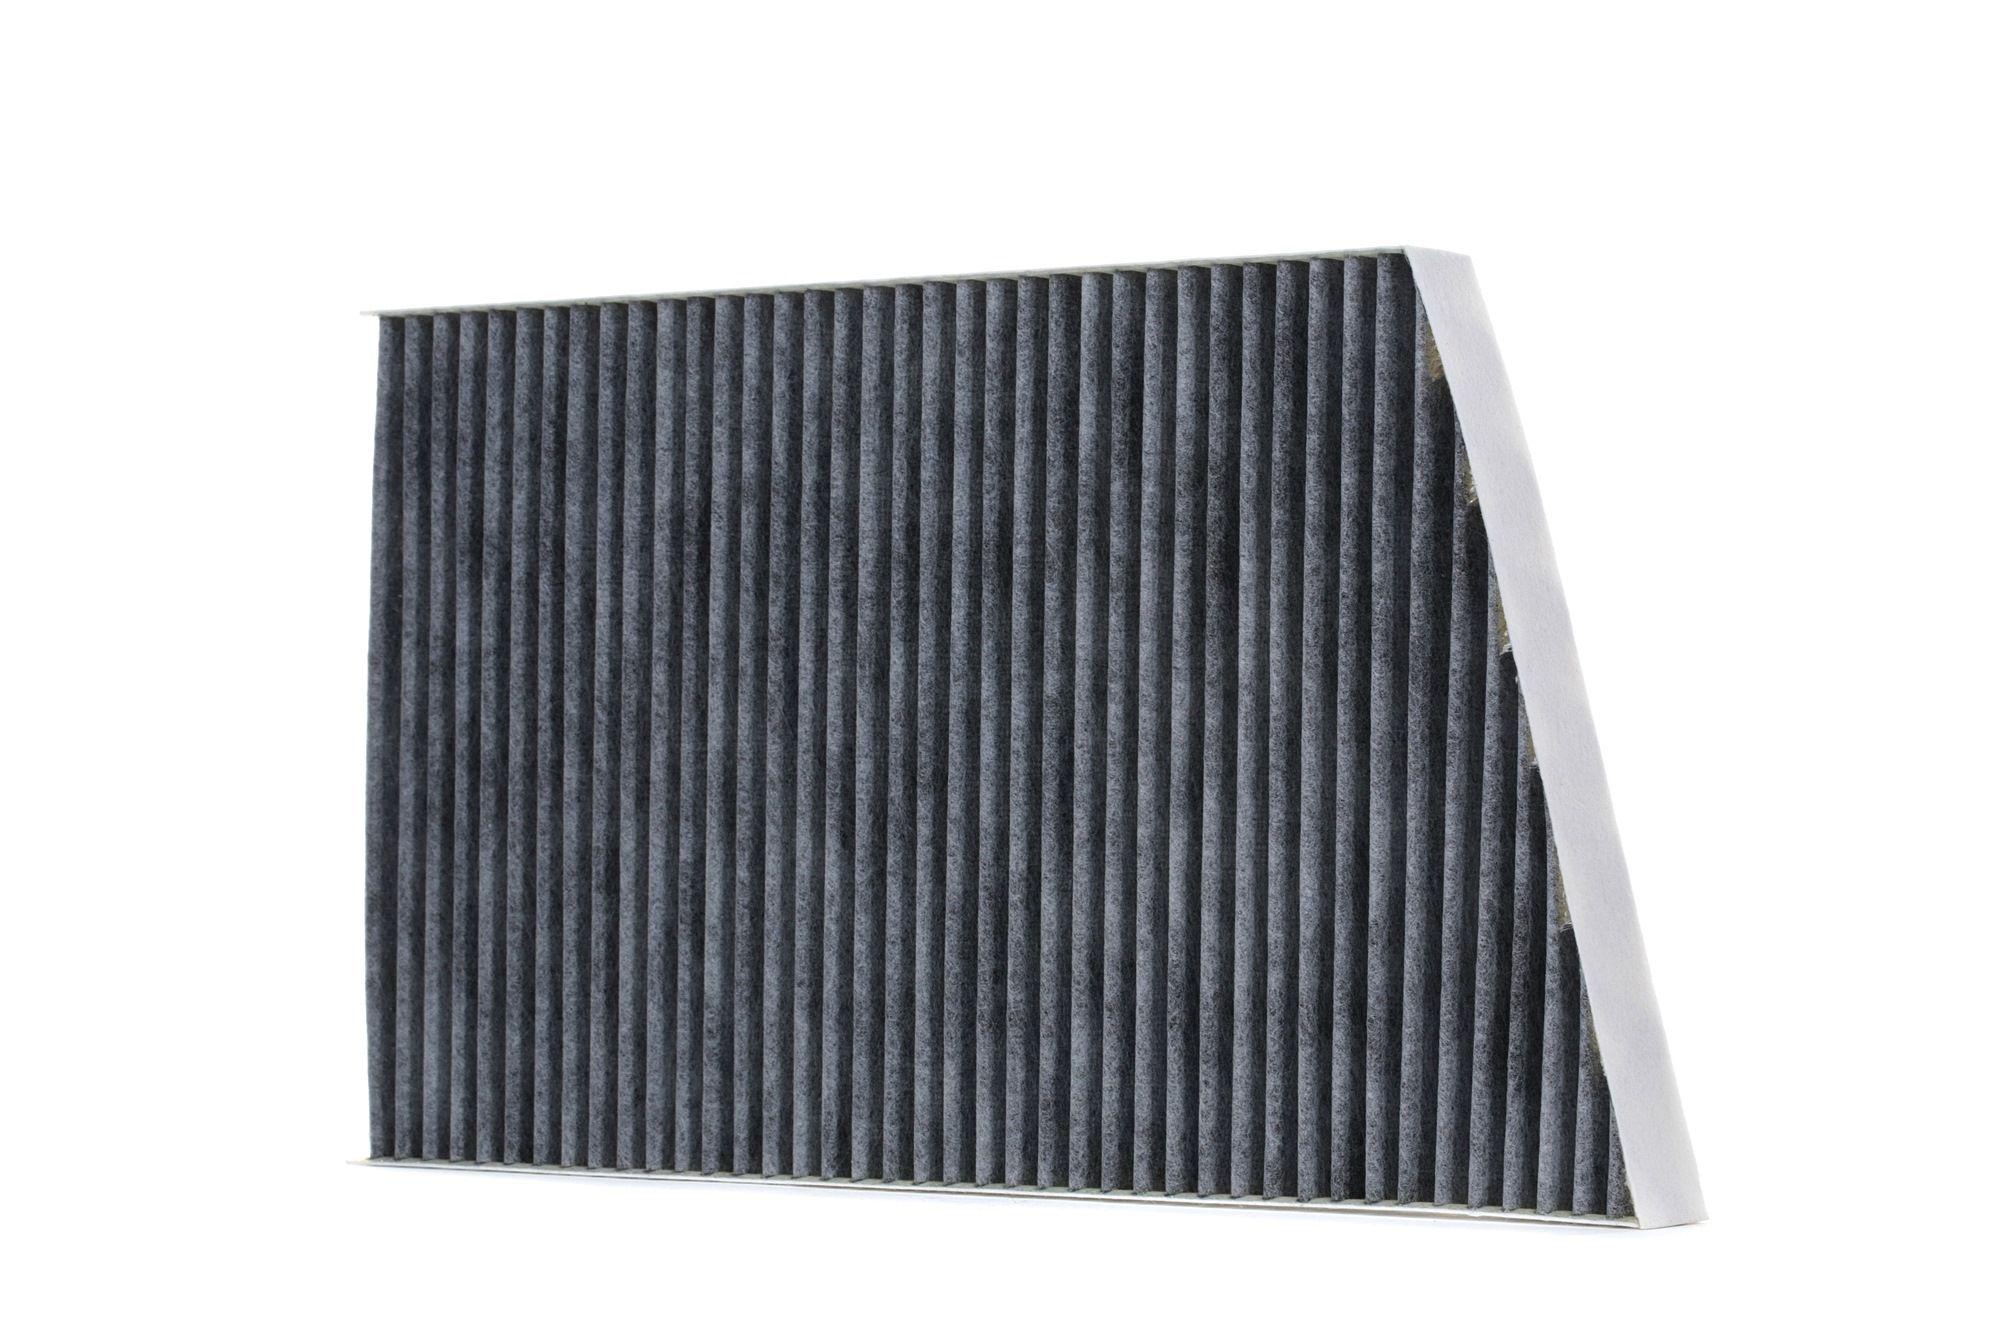 MAHLE ORIGINAL: Original Filter Innenraumluft LAK 129 (Breite: 192mm, Höhe: 25mm, Länge: 332mm)